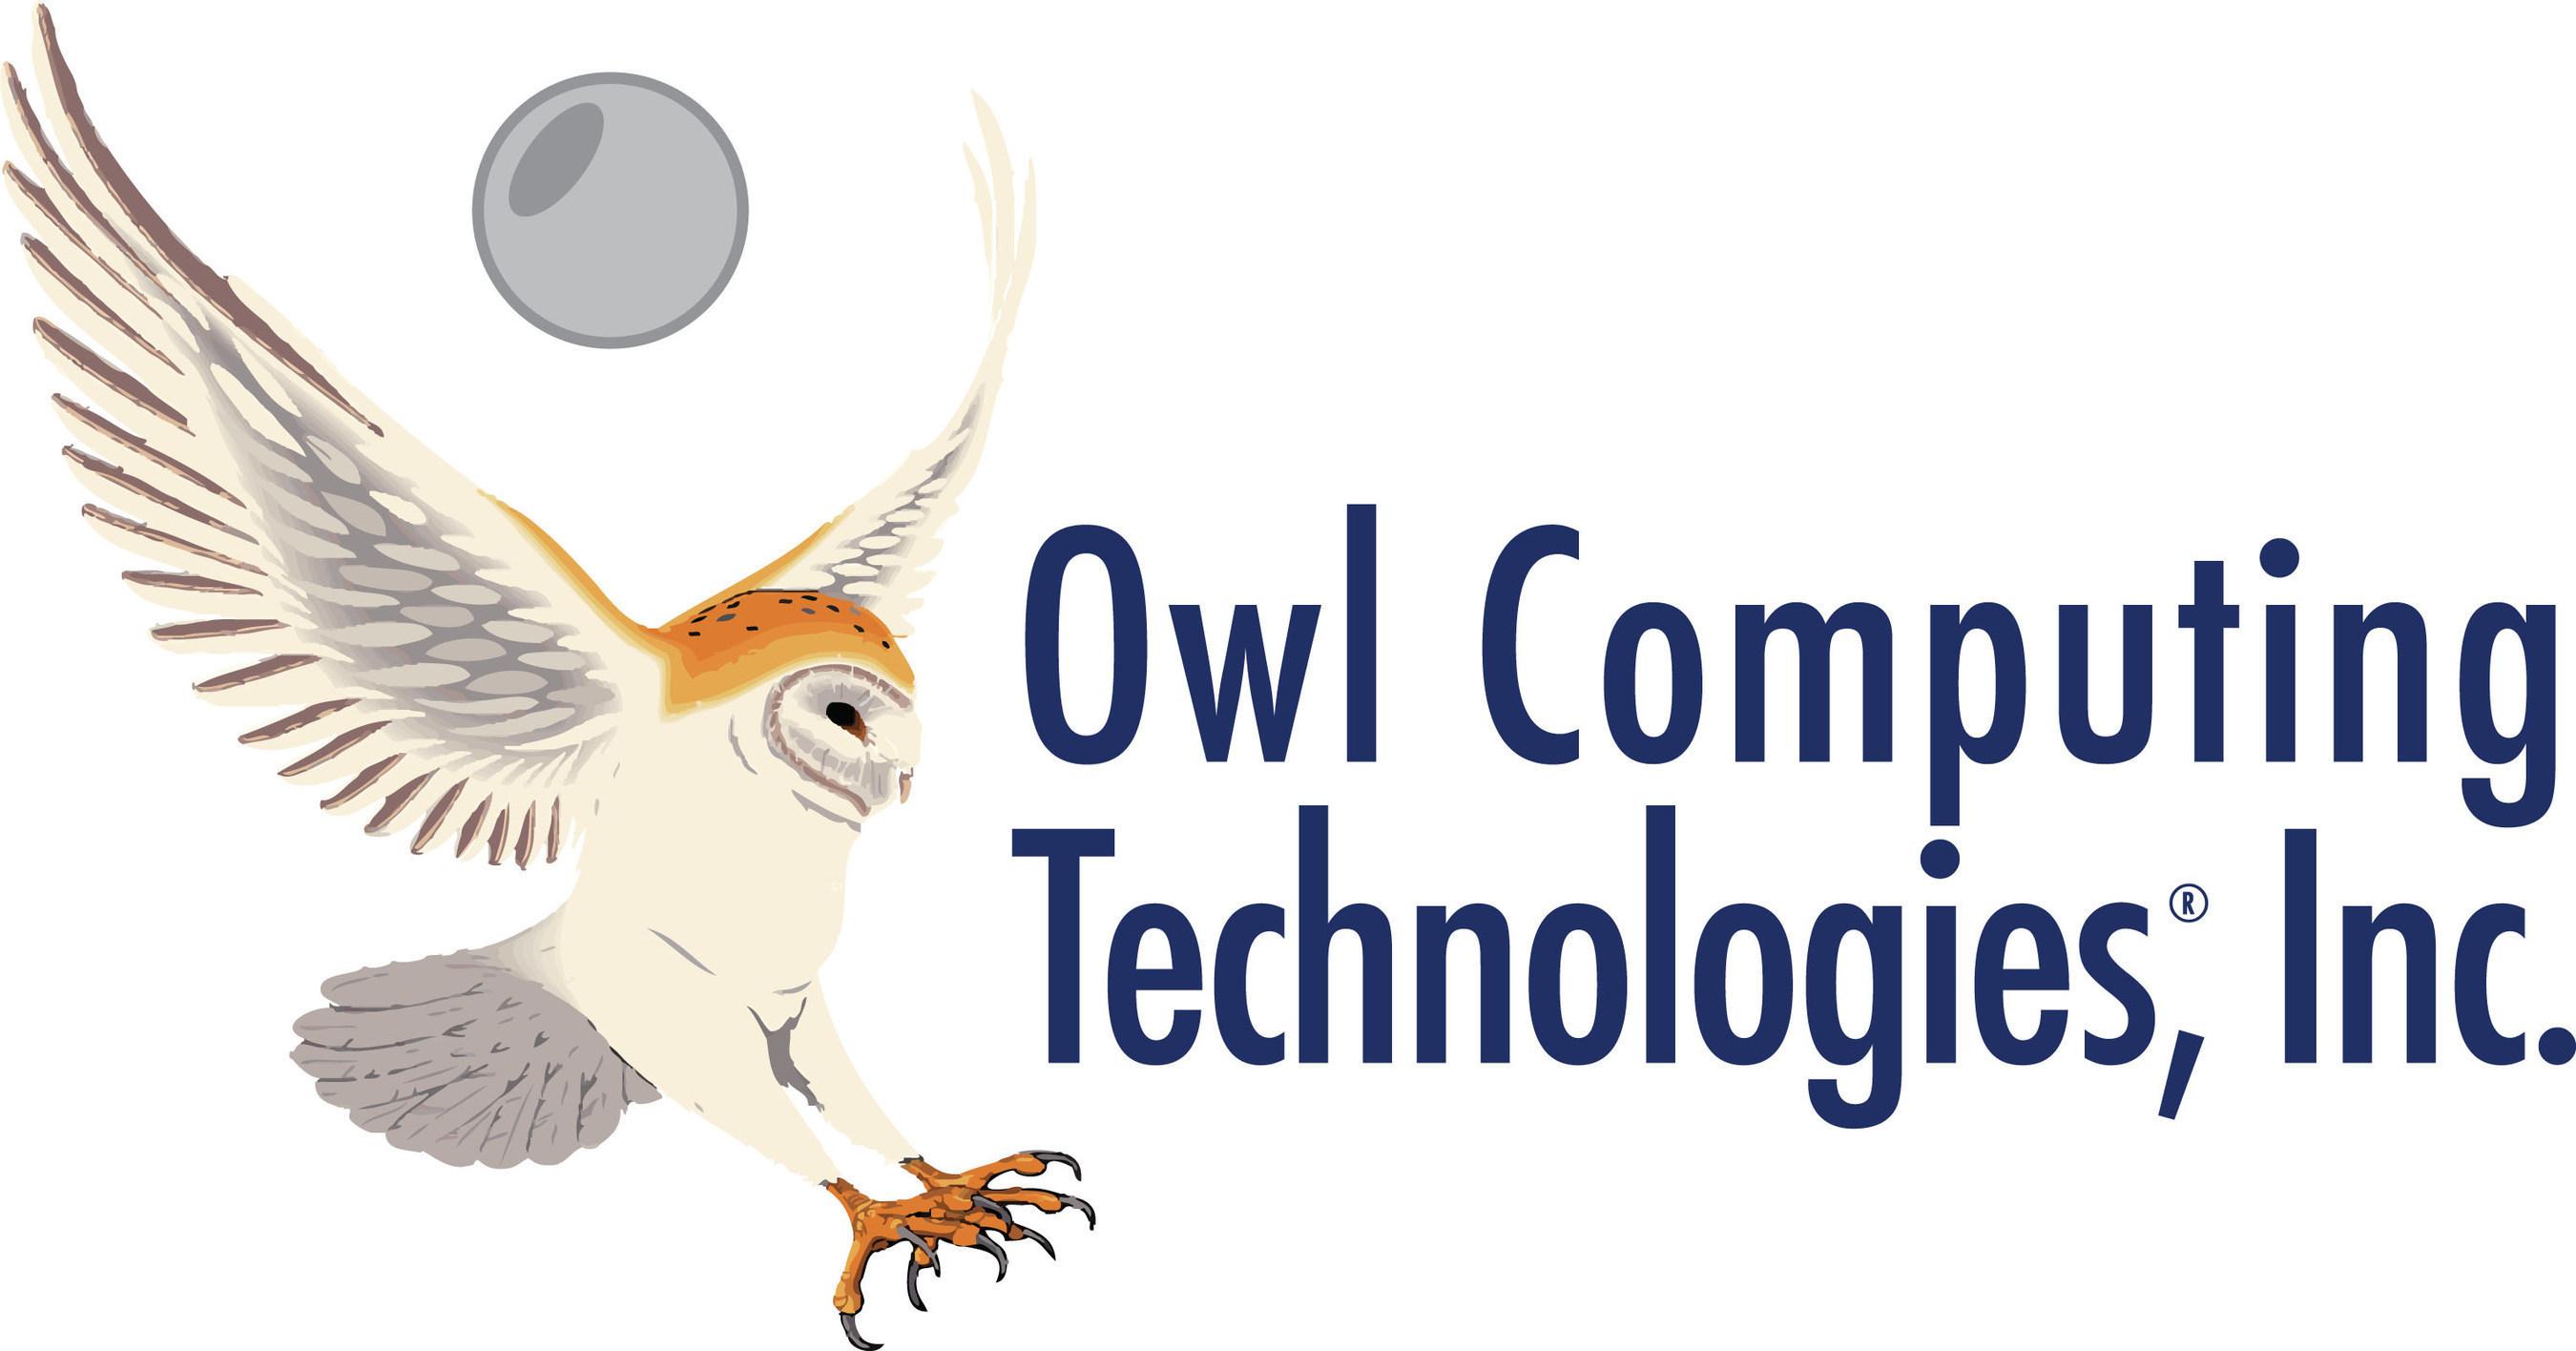 Owl Computing Technologies Sponsors Employee Volunteerism